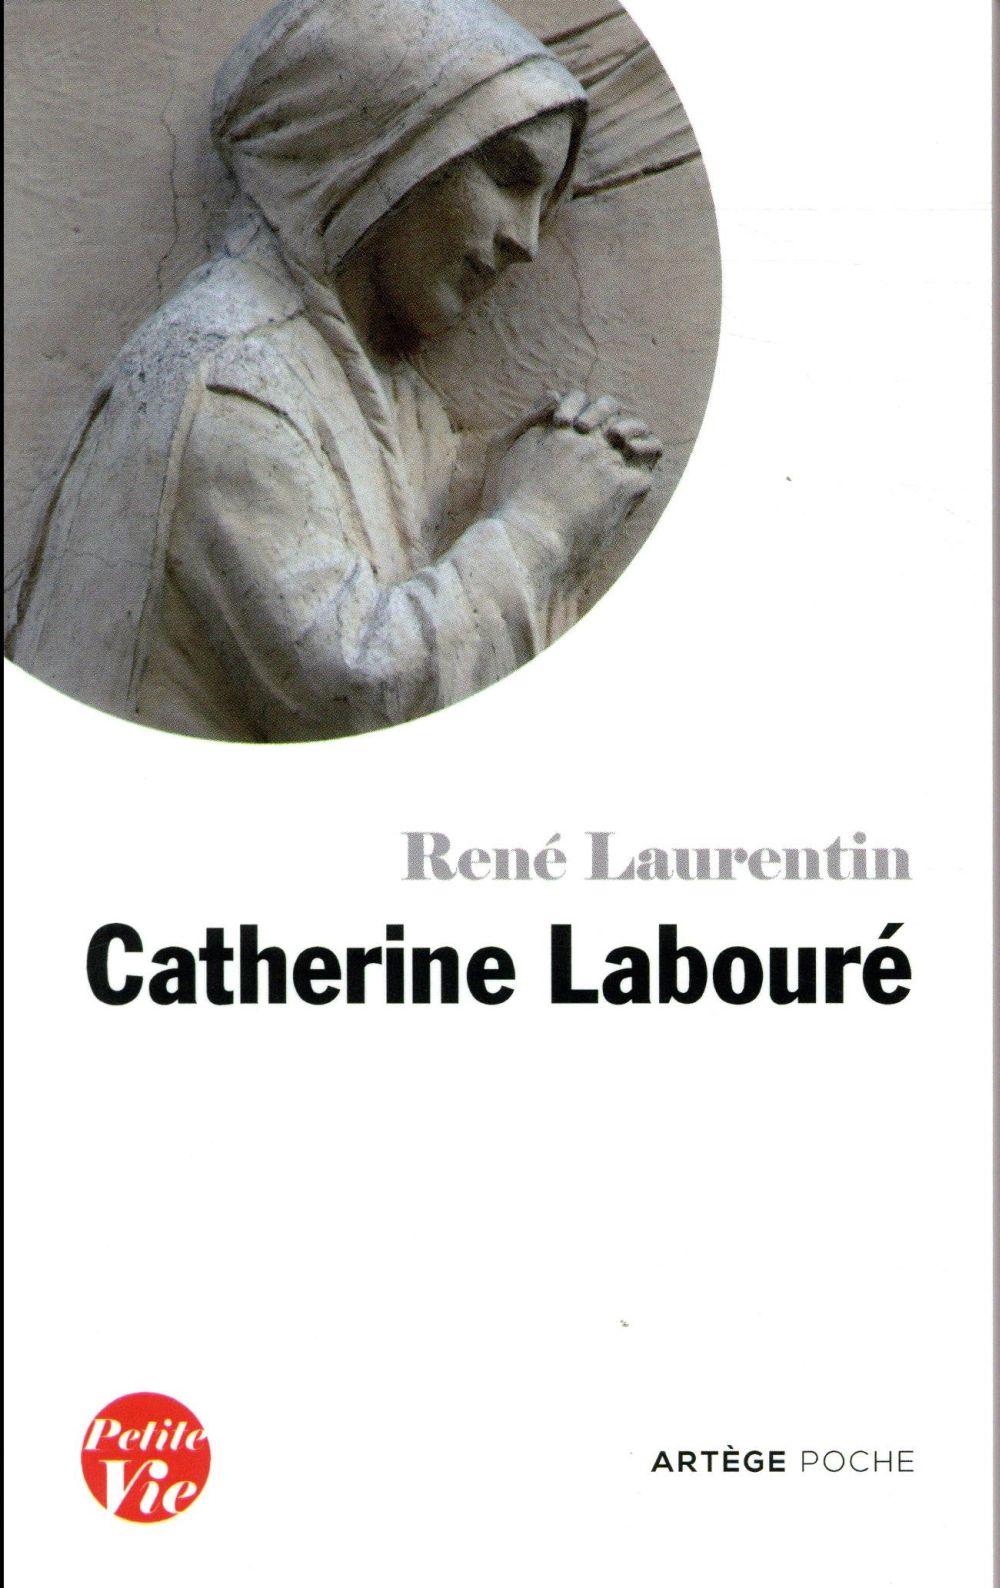 PETITE VIE DE CATHERINE LABOURE